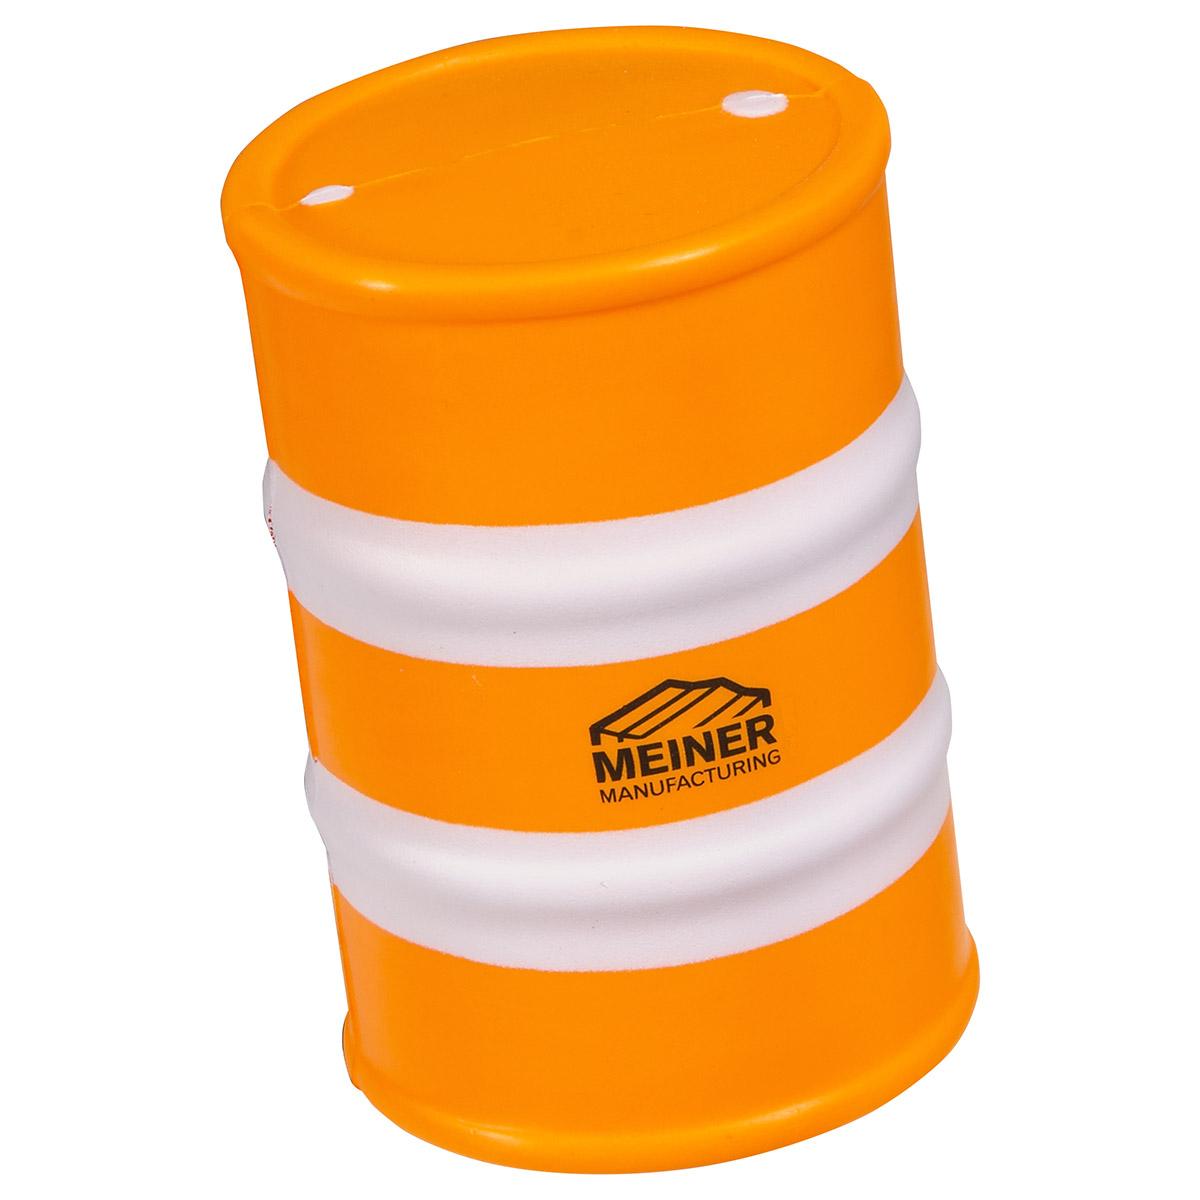 Safety Barrel Stress Reliever, LCN-SB17, 1 Colour Imprint